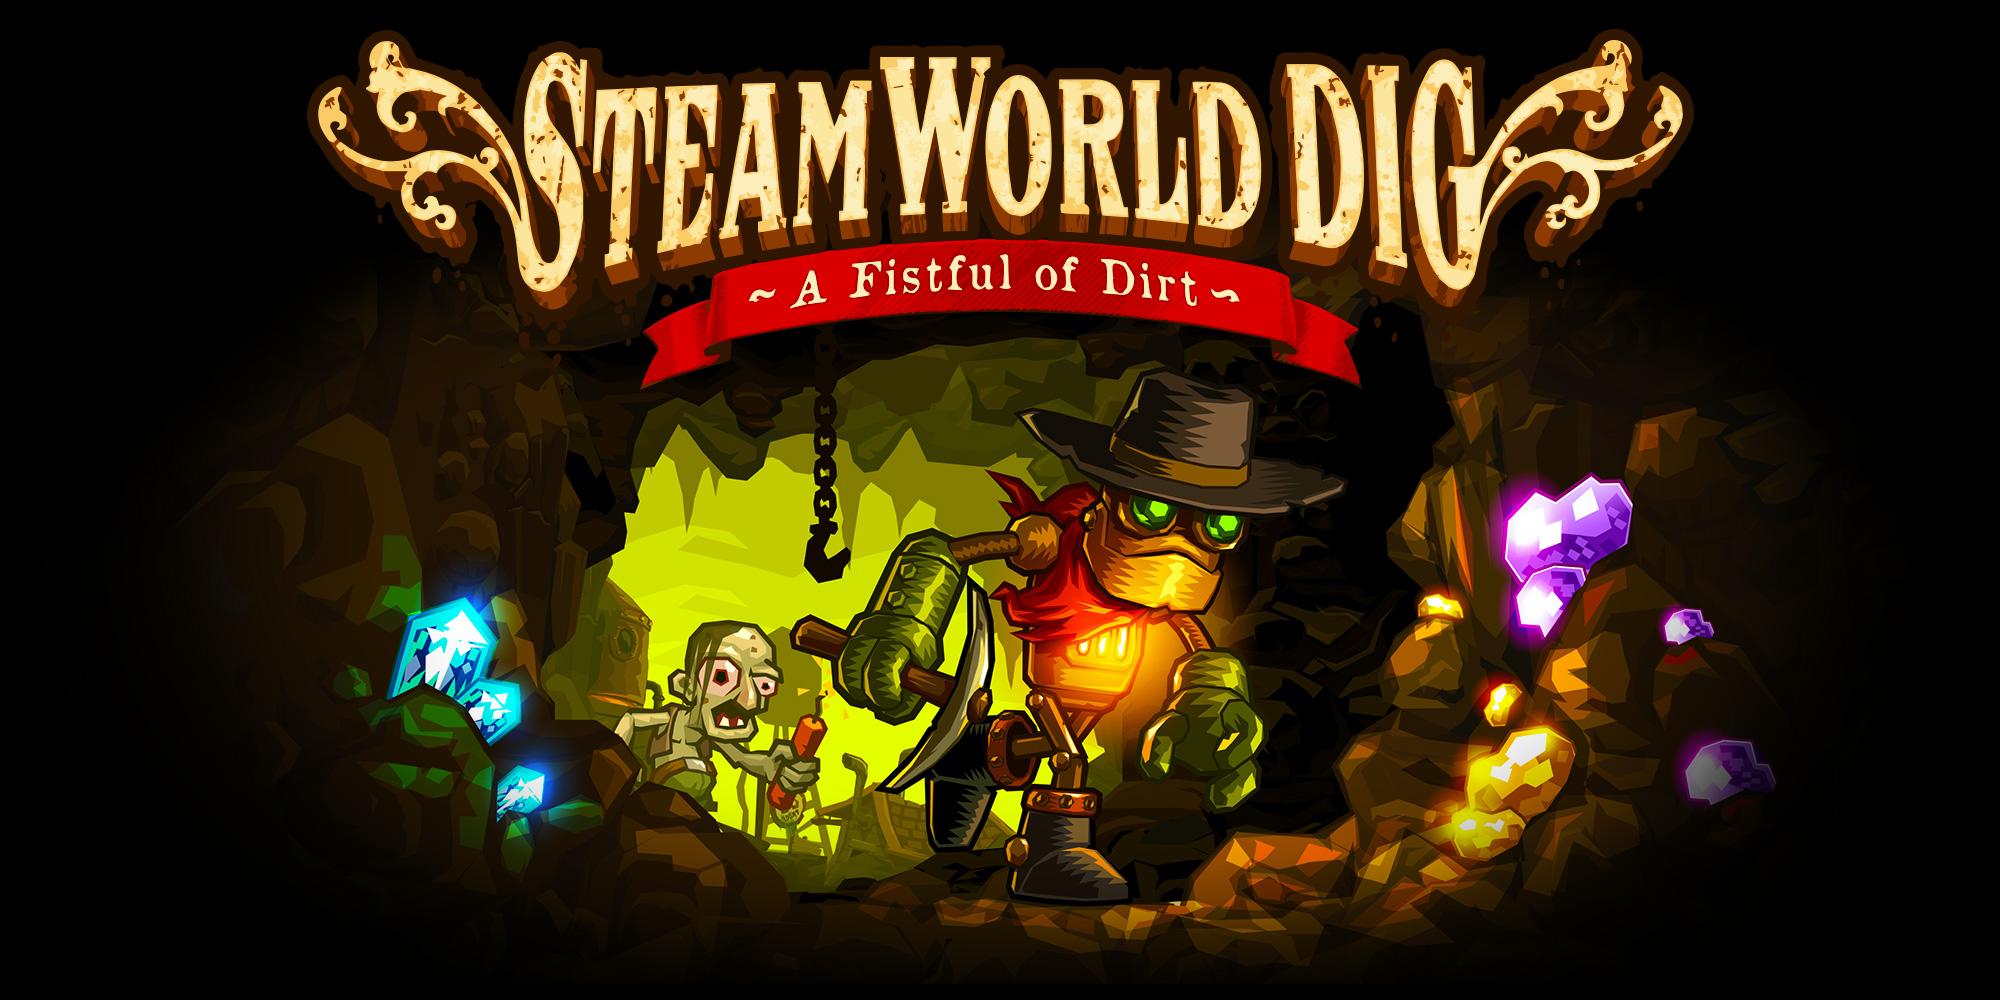 H2x1_NSwitchDS_SteamWorldDig.jpg